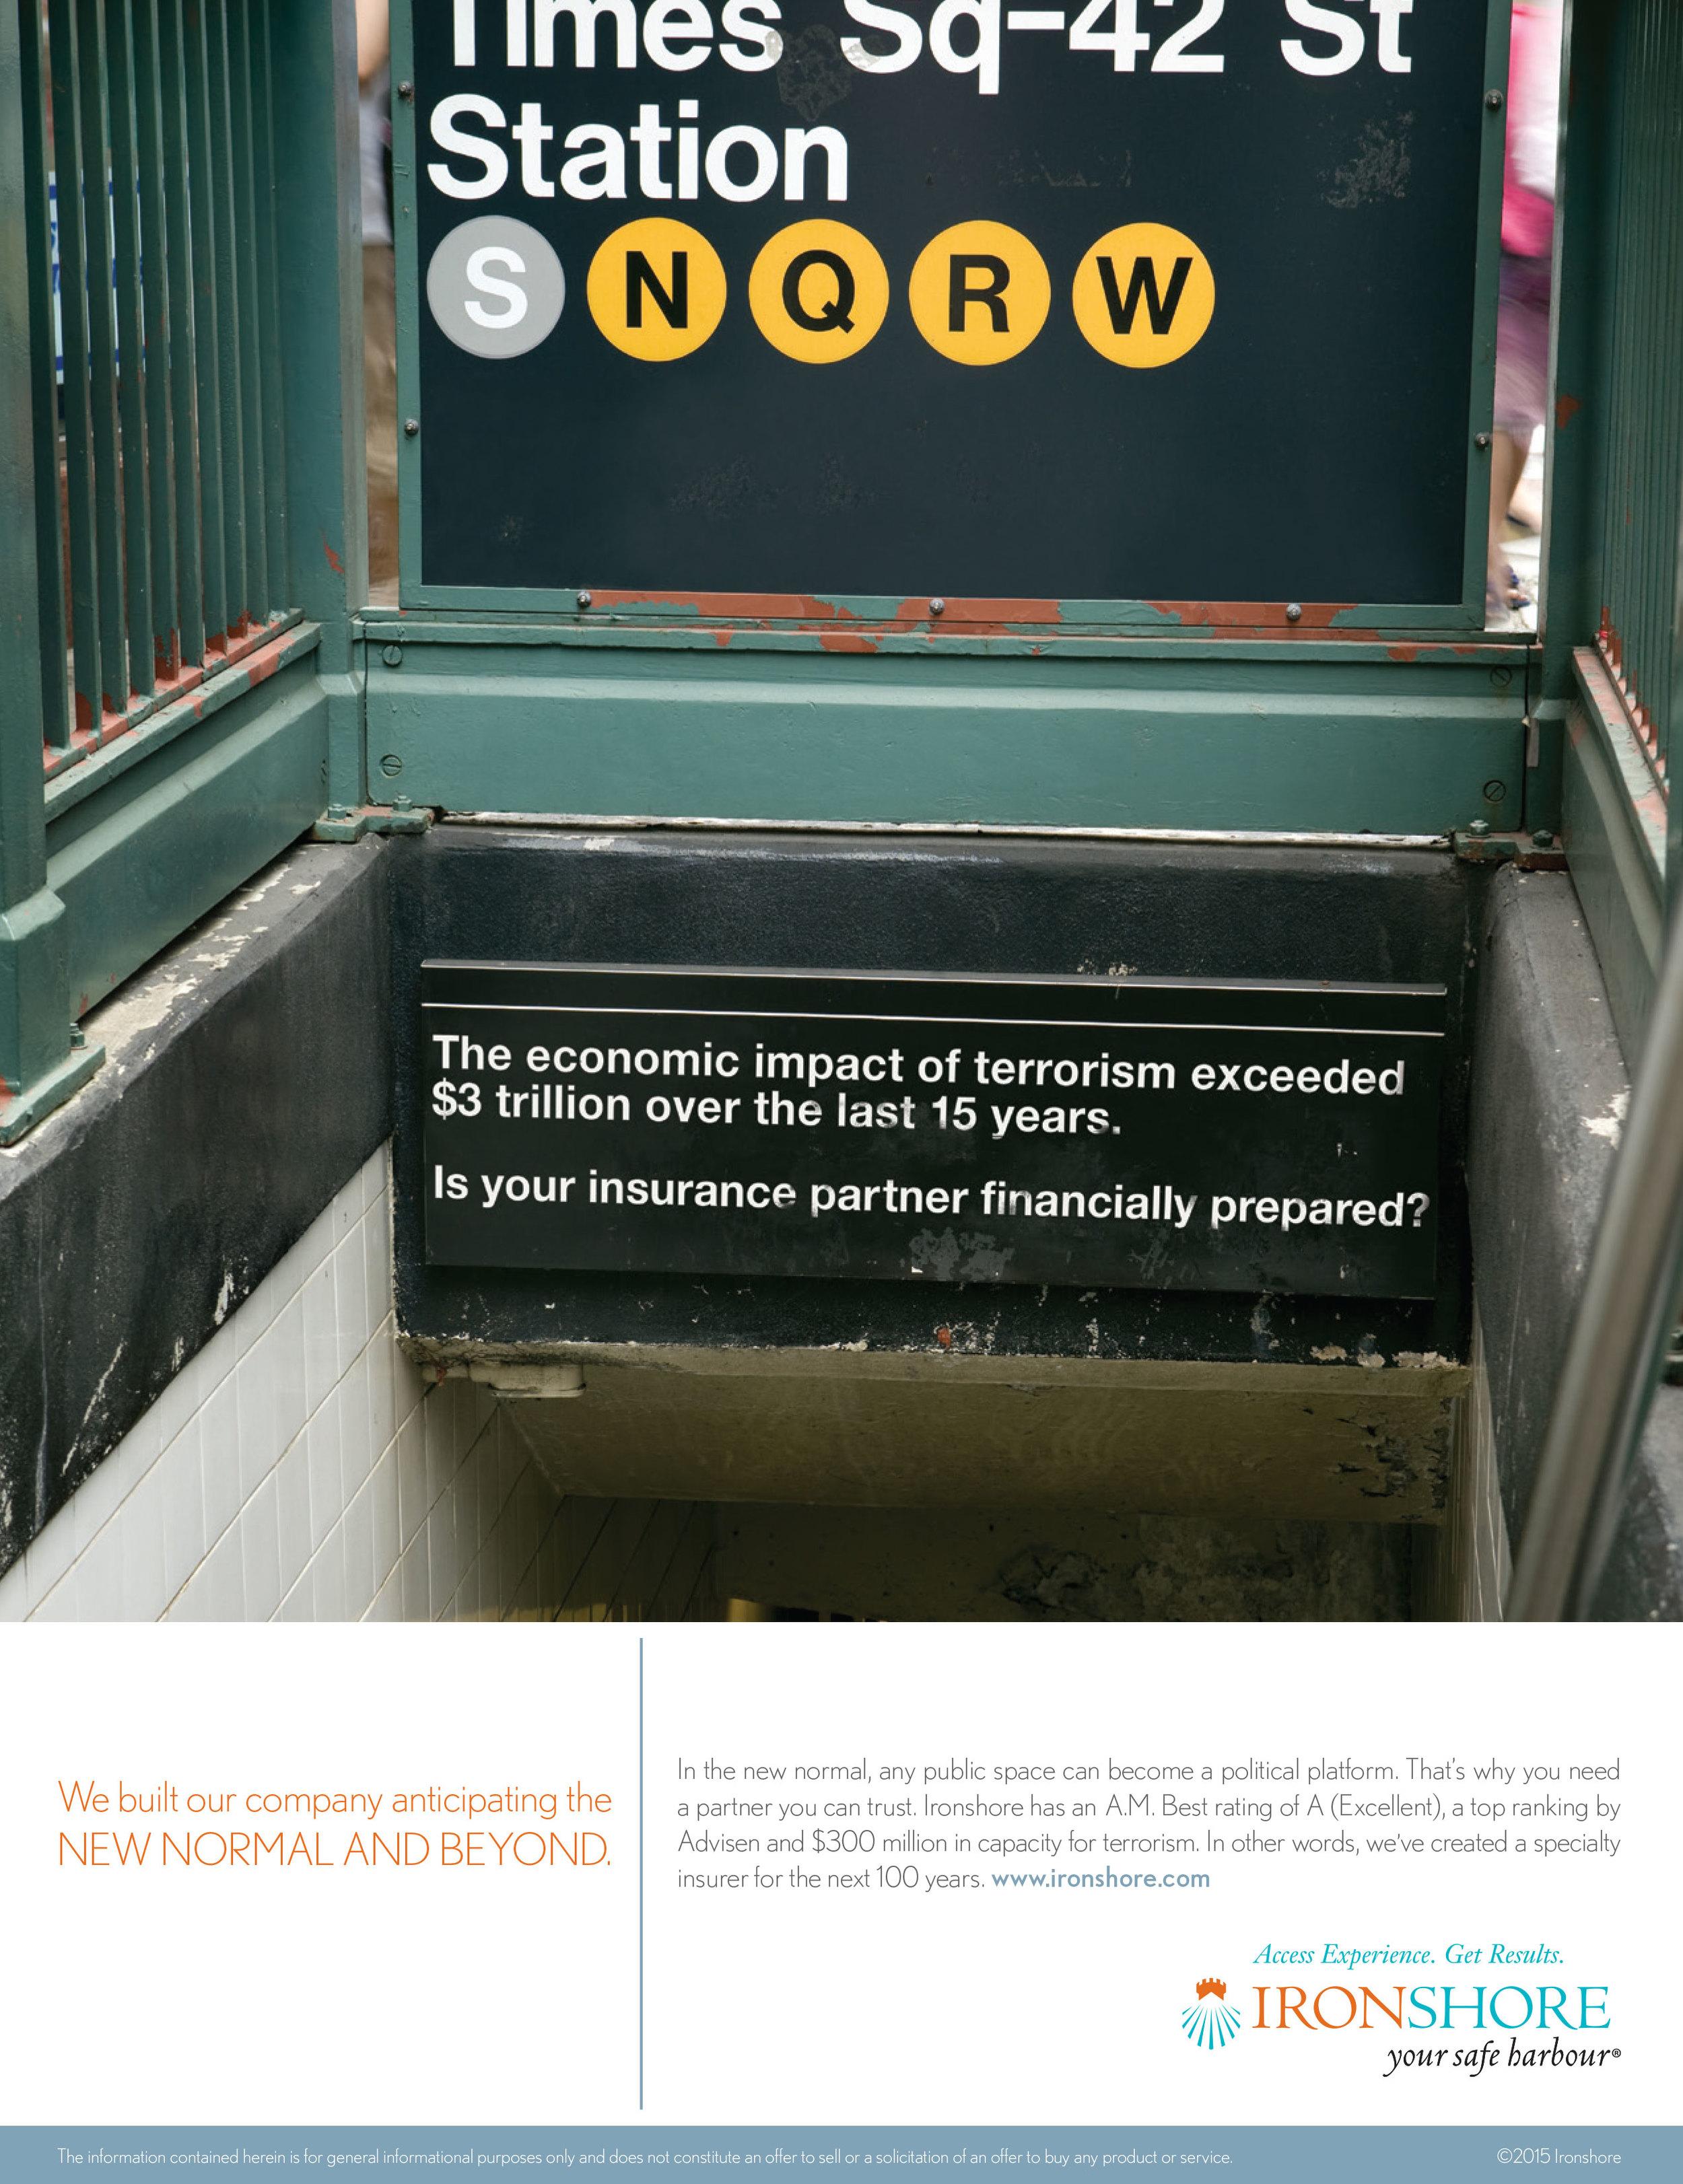 ironshore-insurance-advertising-economic-impact-terrorism.jpg